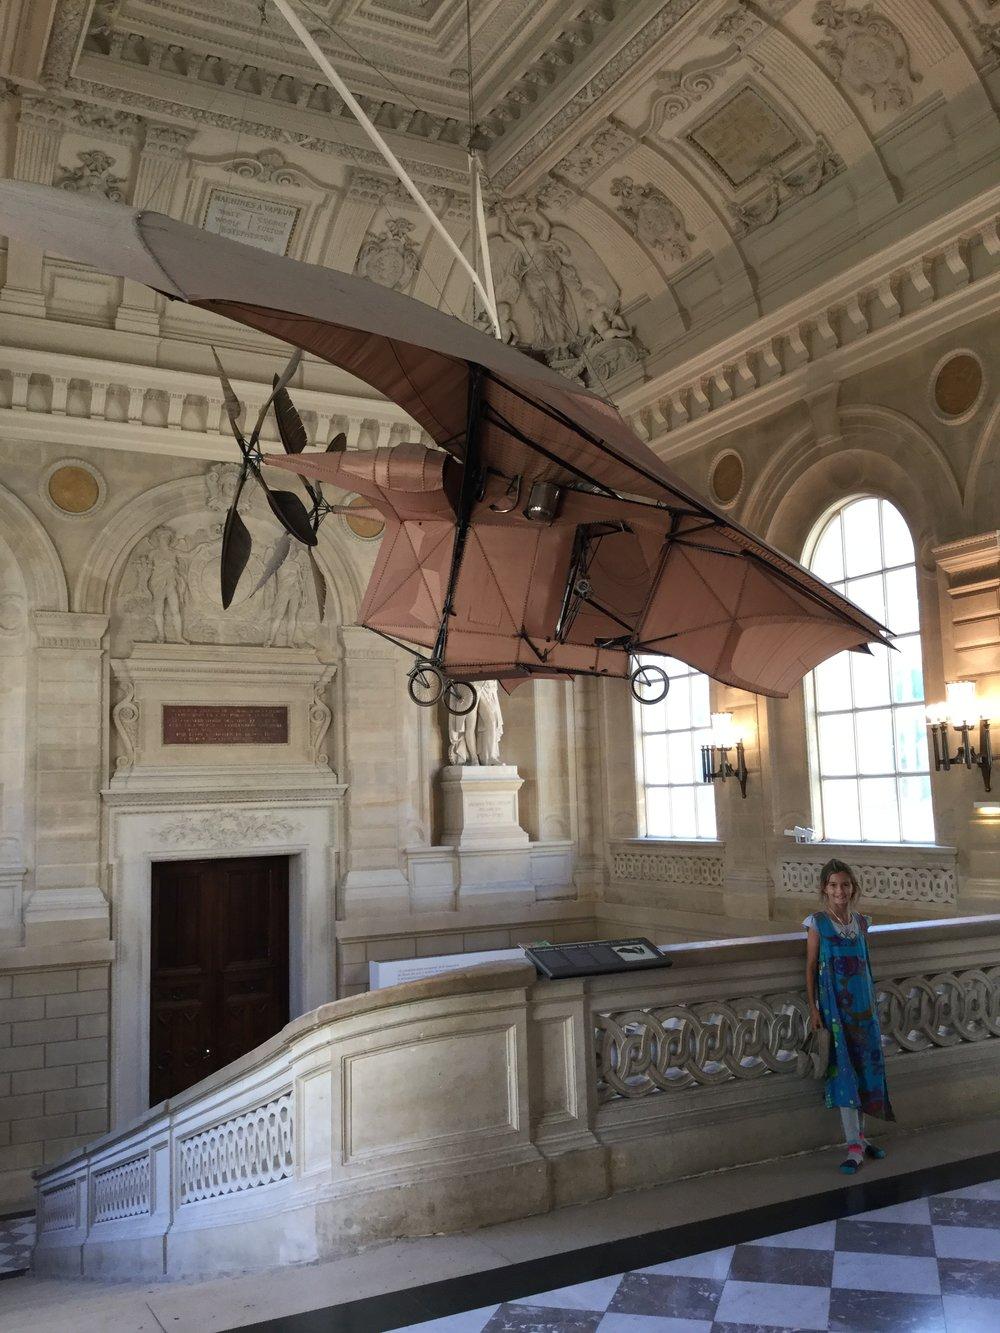 A flying machine.